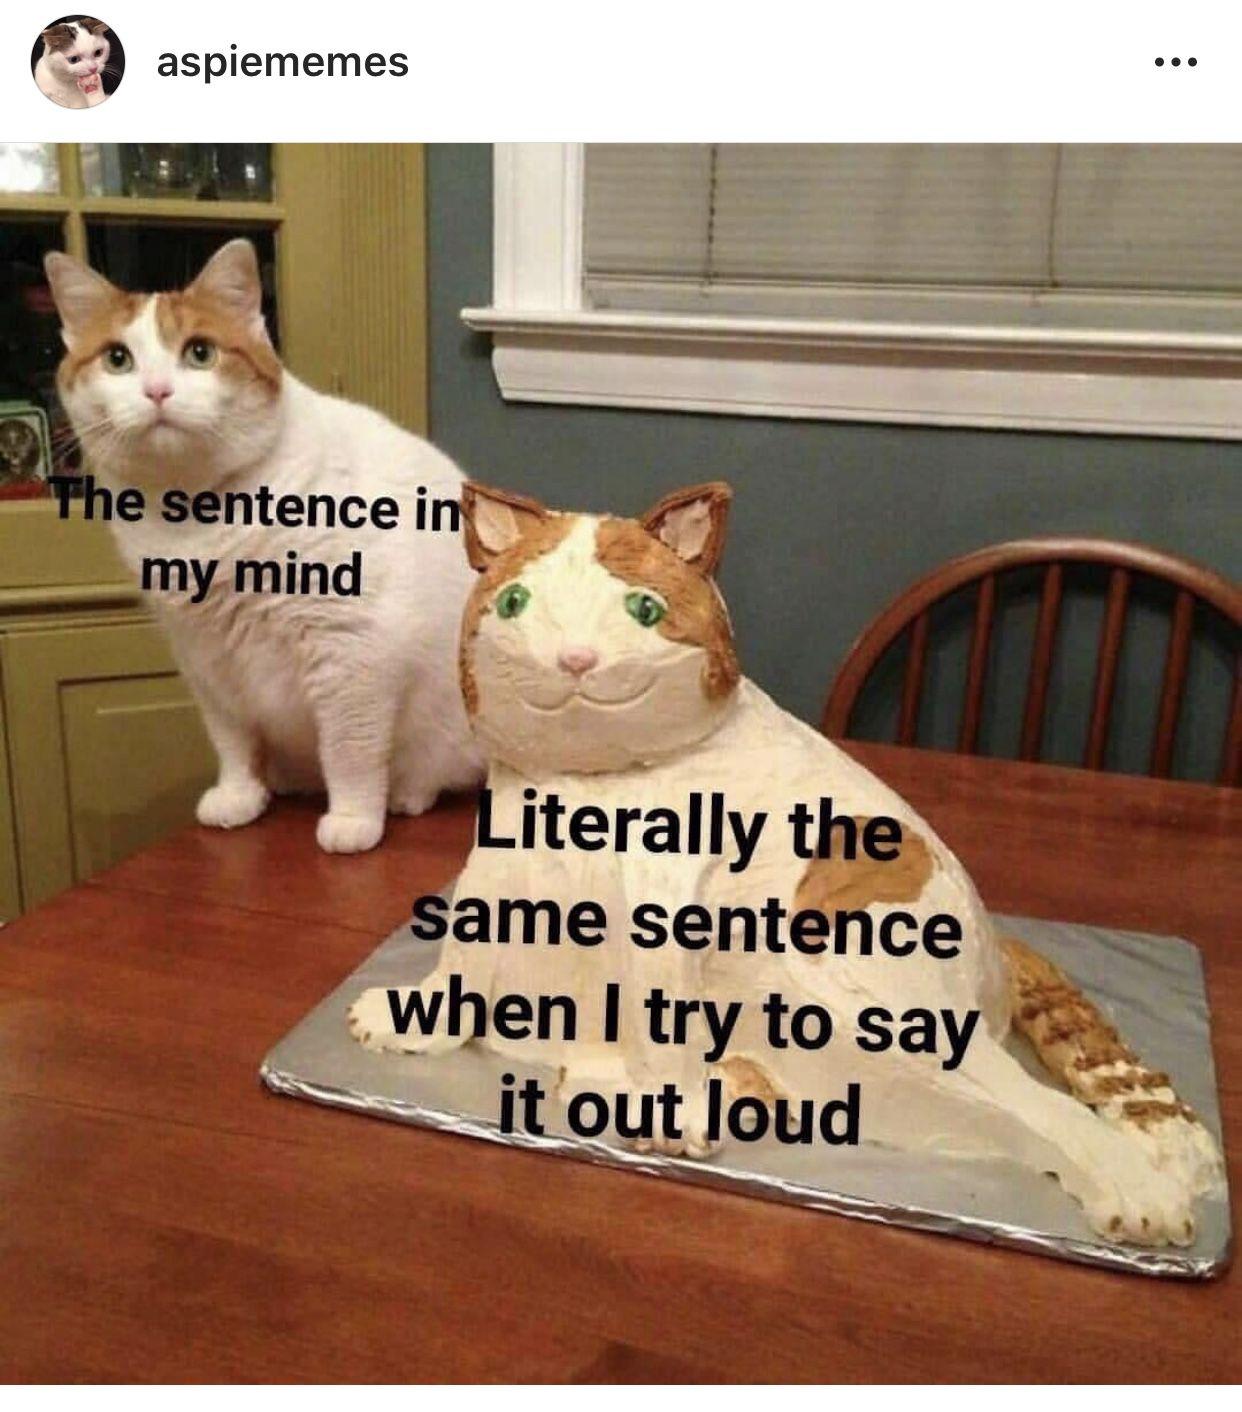 Pin De Alejandra Aceves En Cats Memes Divertidos Meme Gato Memes Gracioso